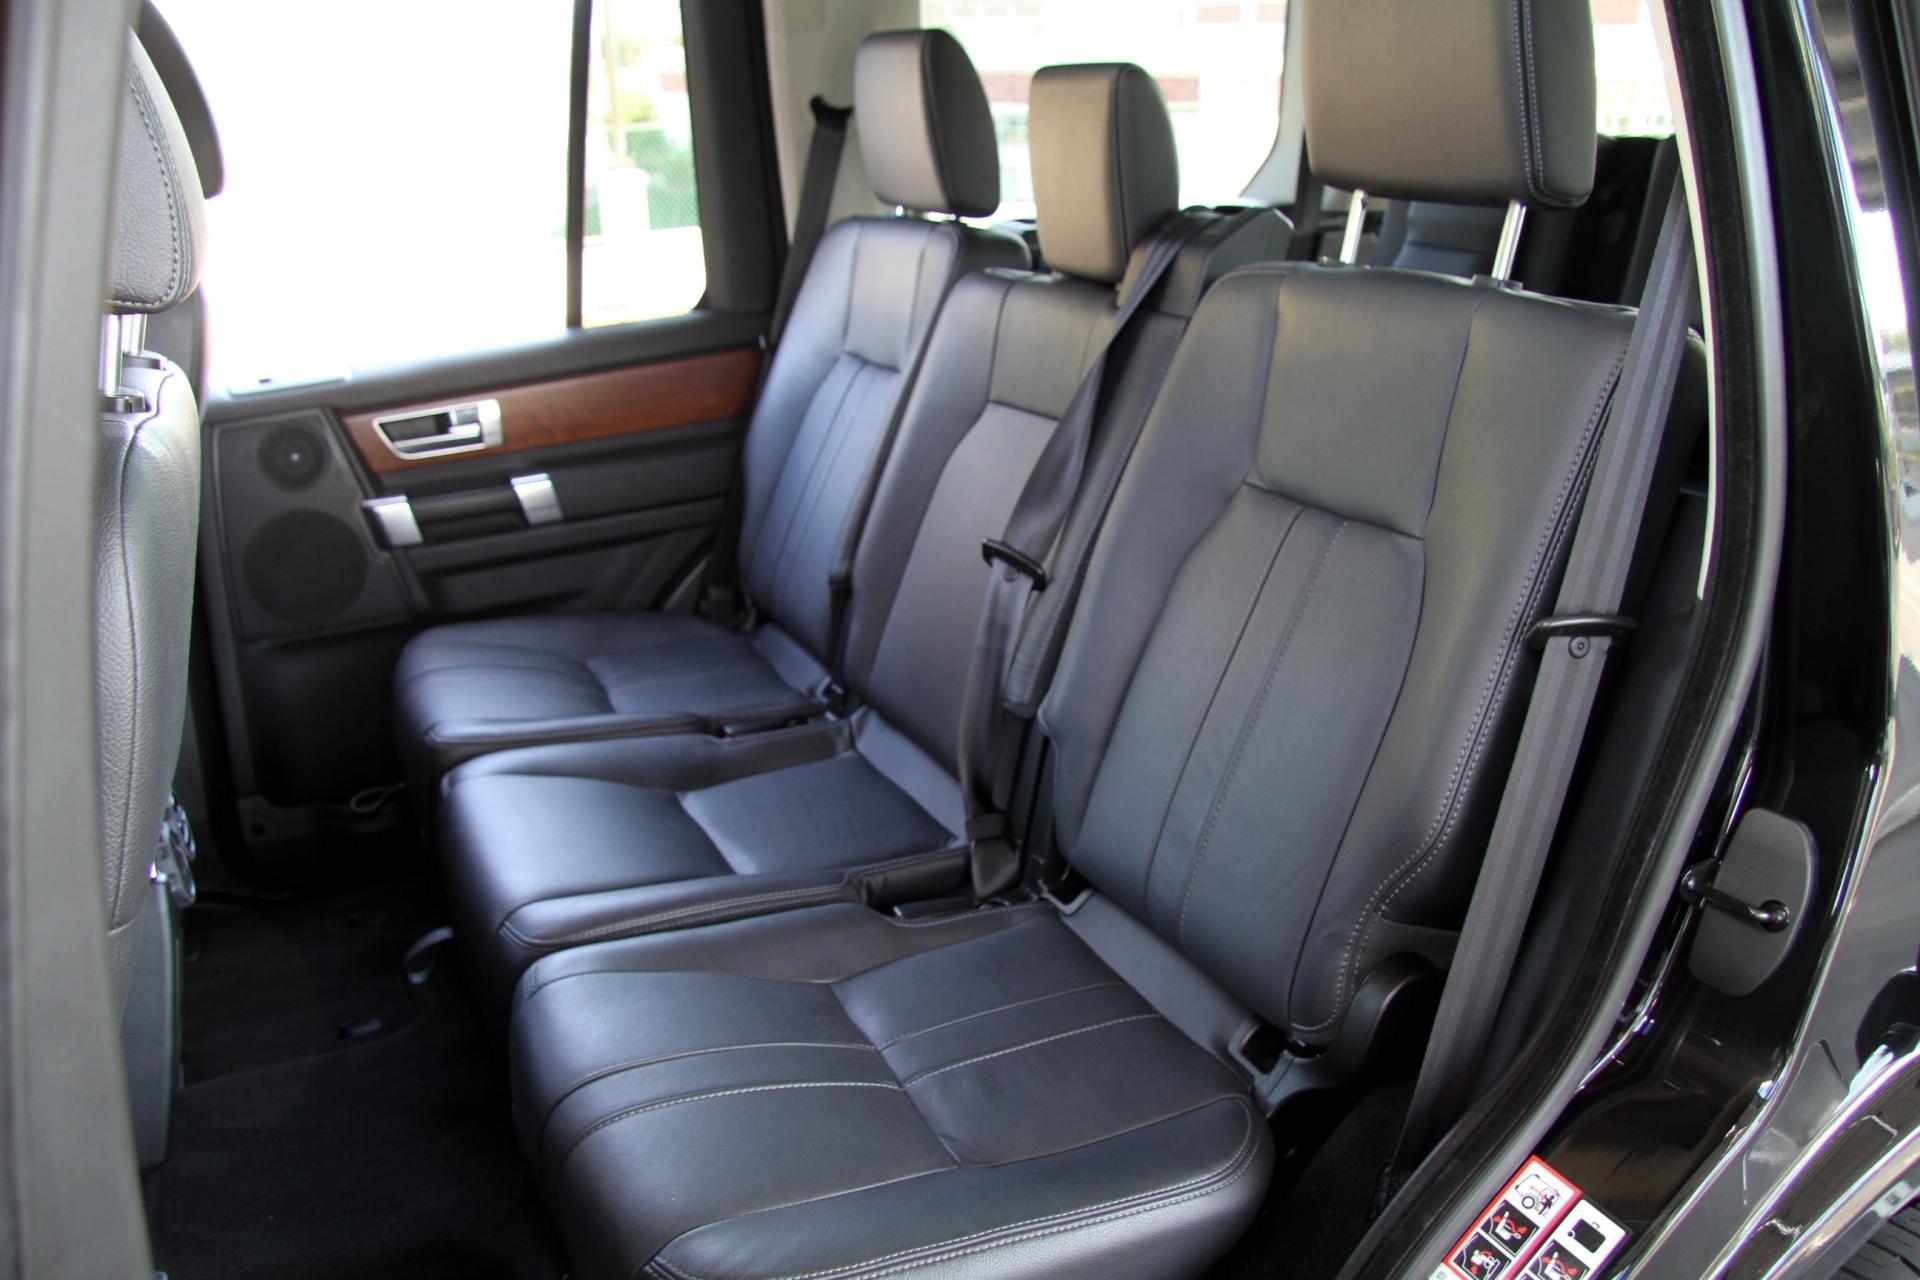 2016 Land Rover LR4 HSE Stock 5998 for sale near Redondo Beach